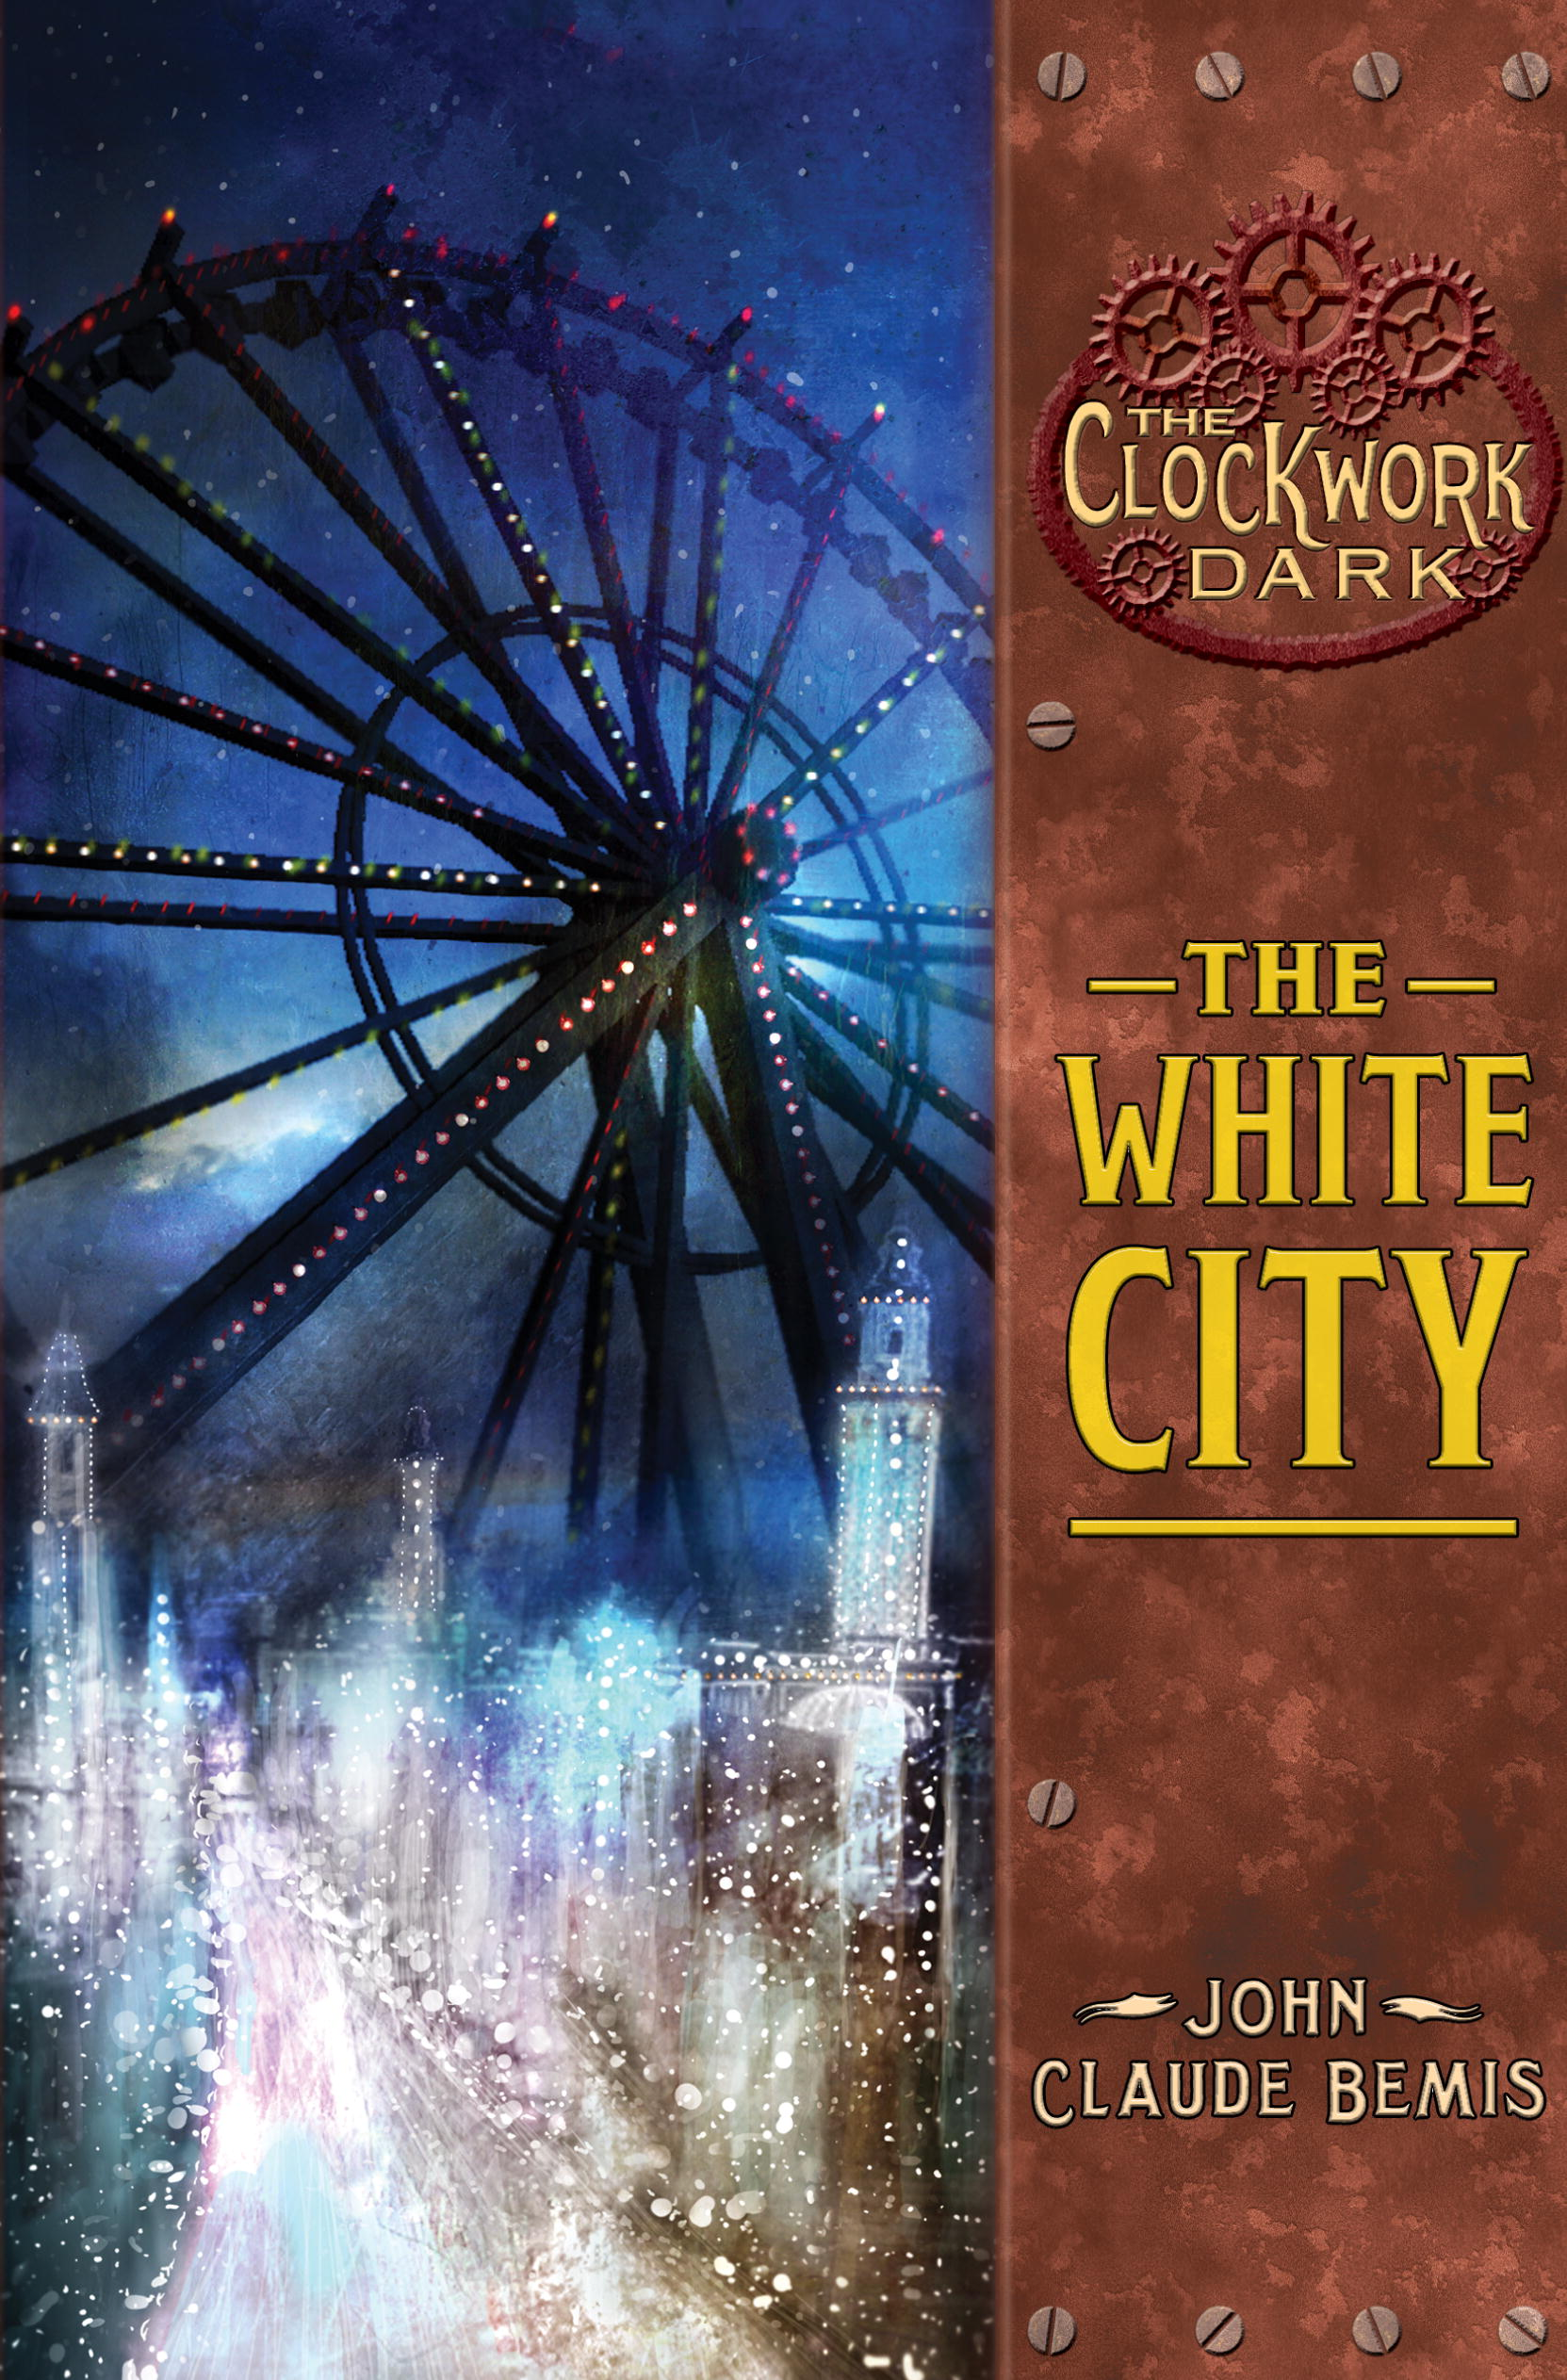 Book Three - The White City